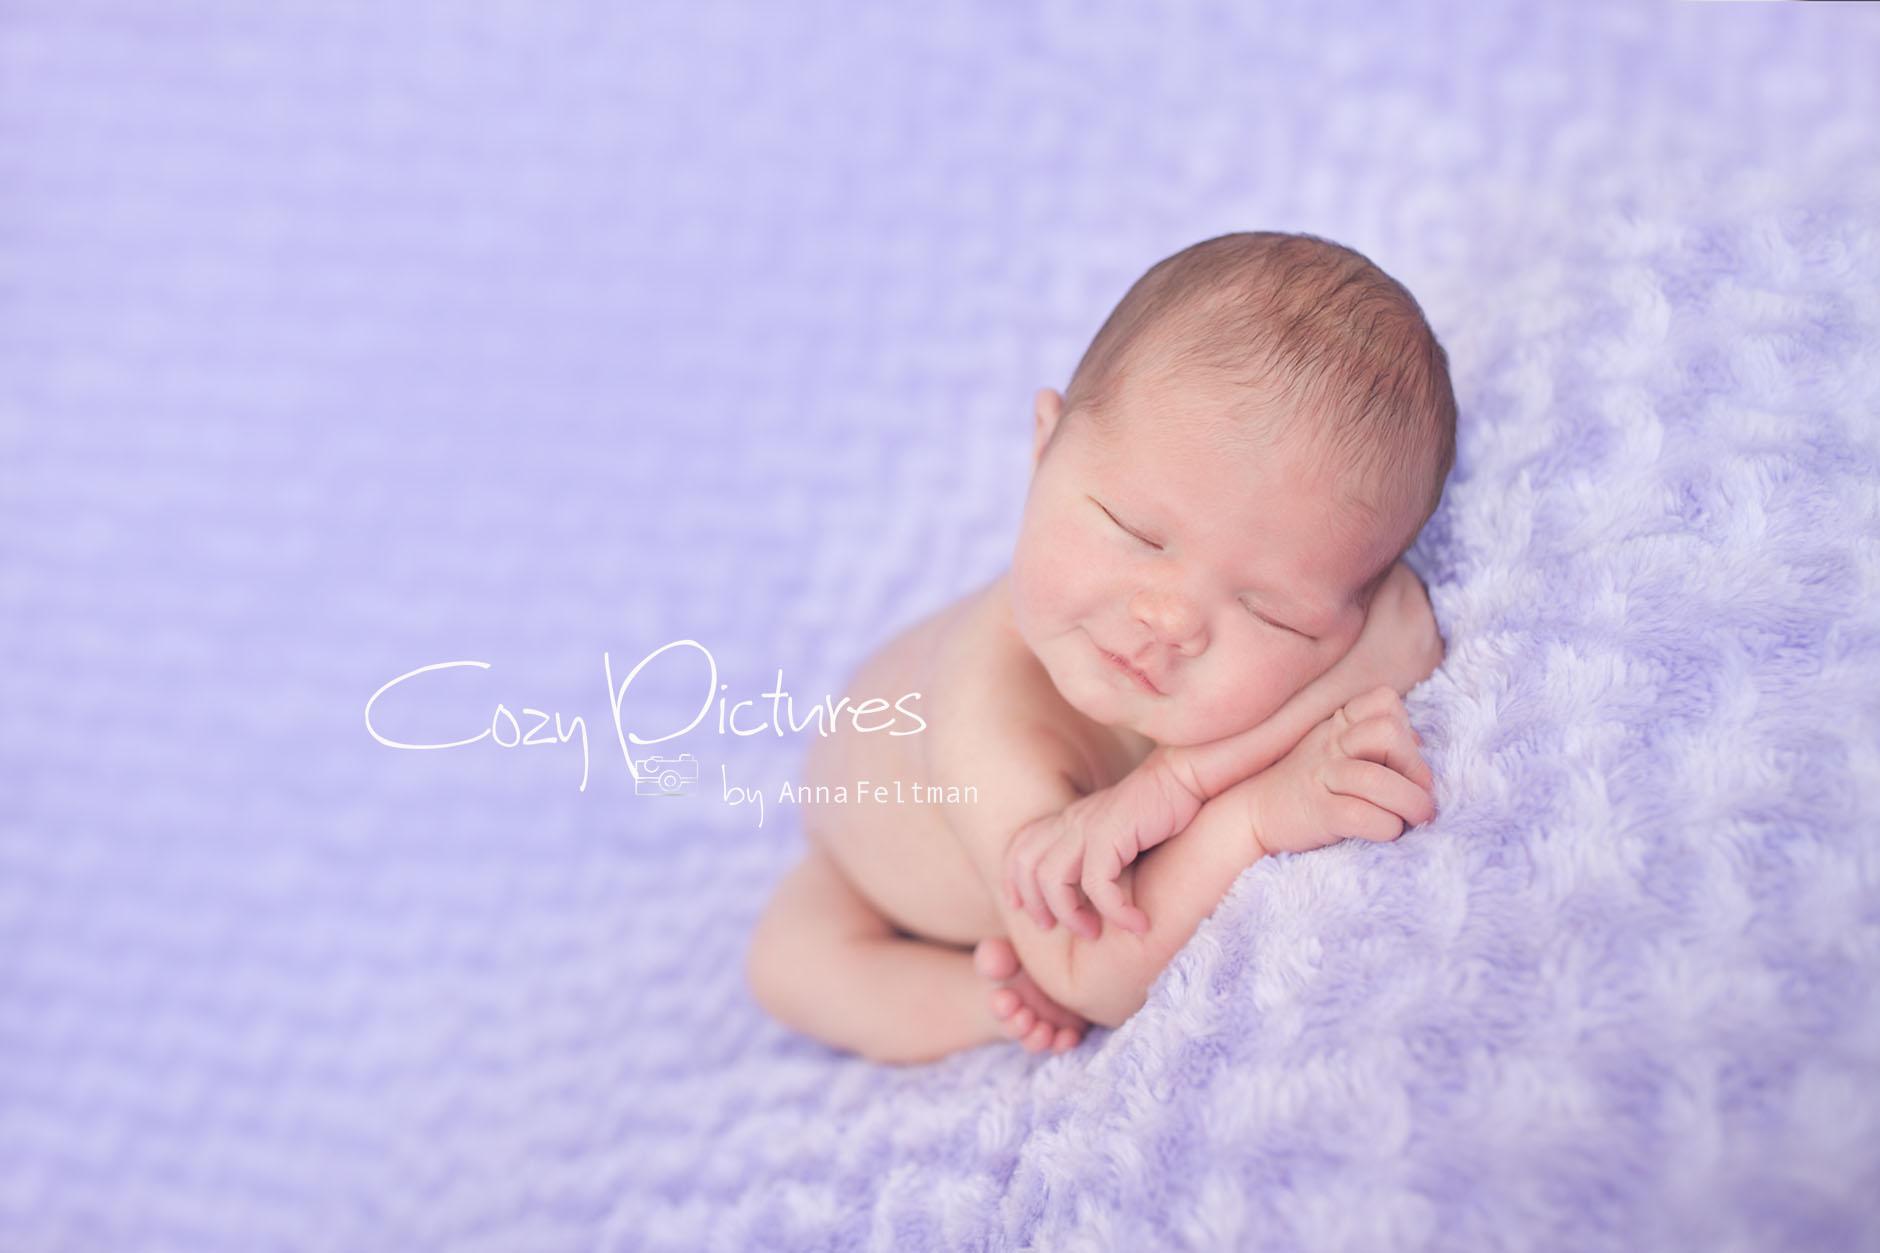 Newborn_Orlando_5_cozy_pictures.jpg